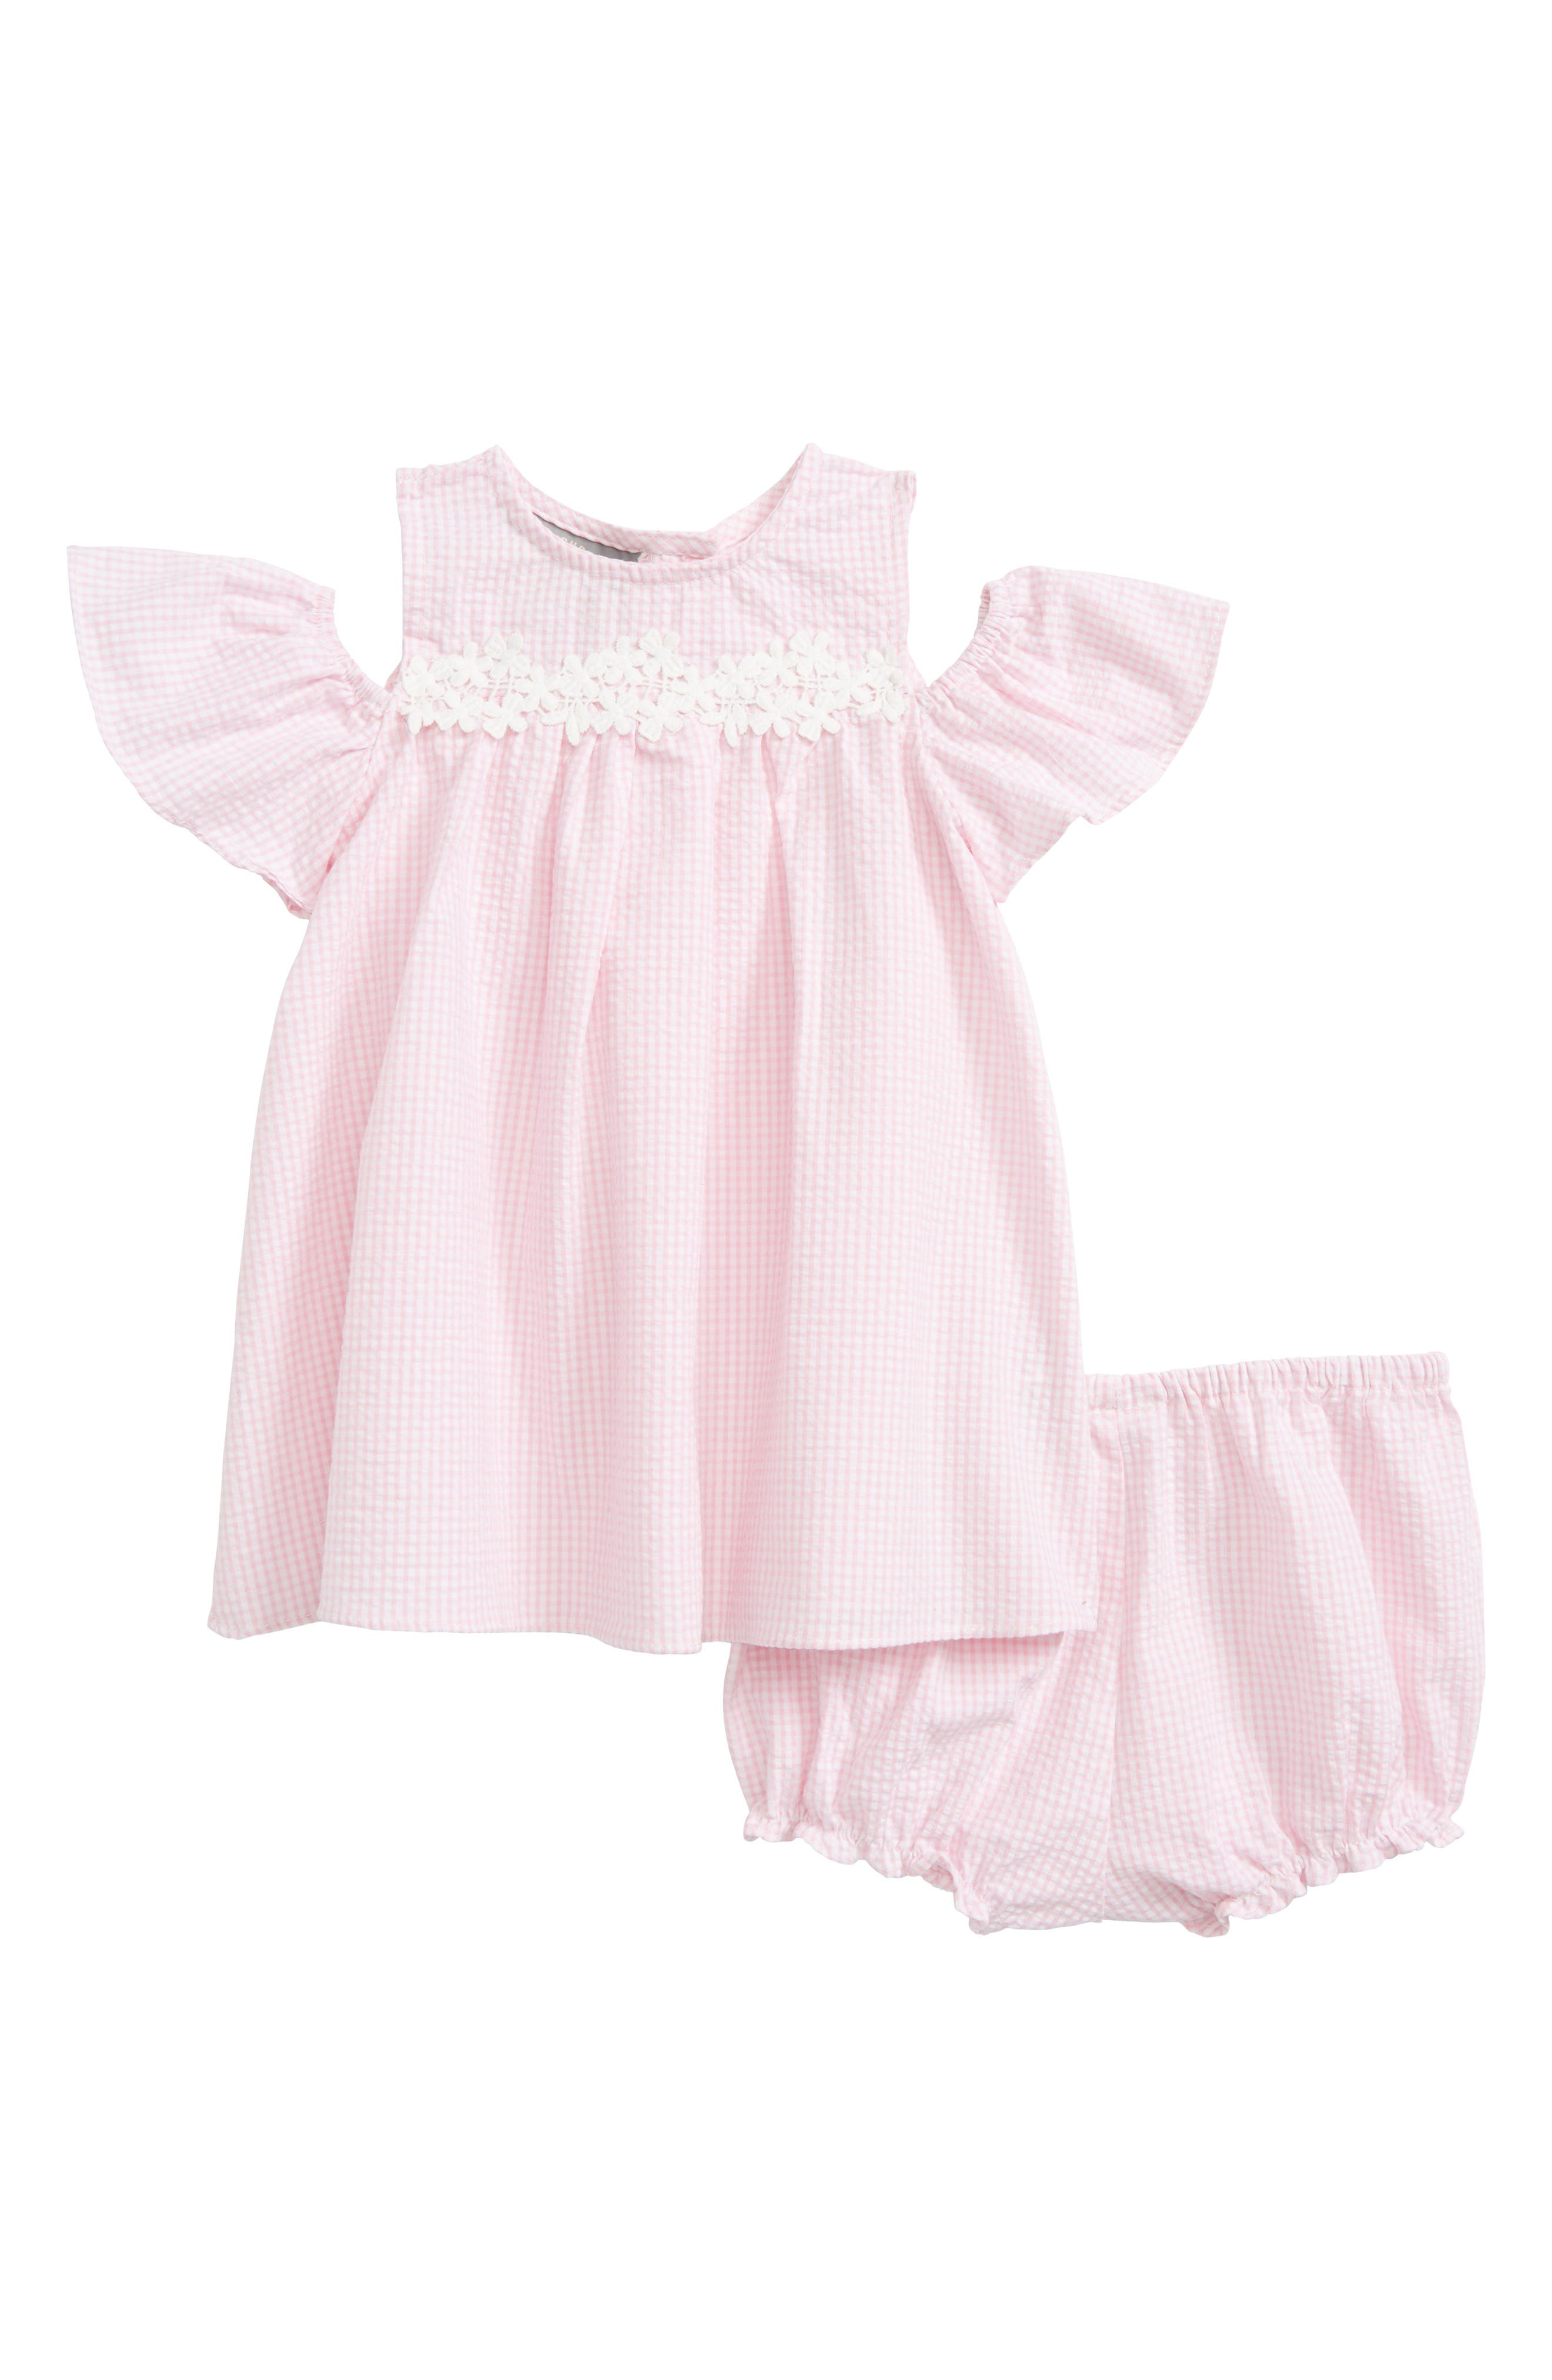 Seersucker Cold Shoulder Dress,                             Main thumbnail 1, color,                             Pink White